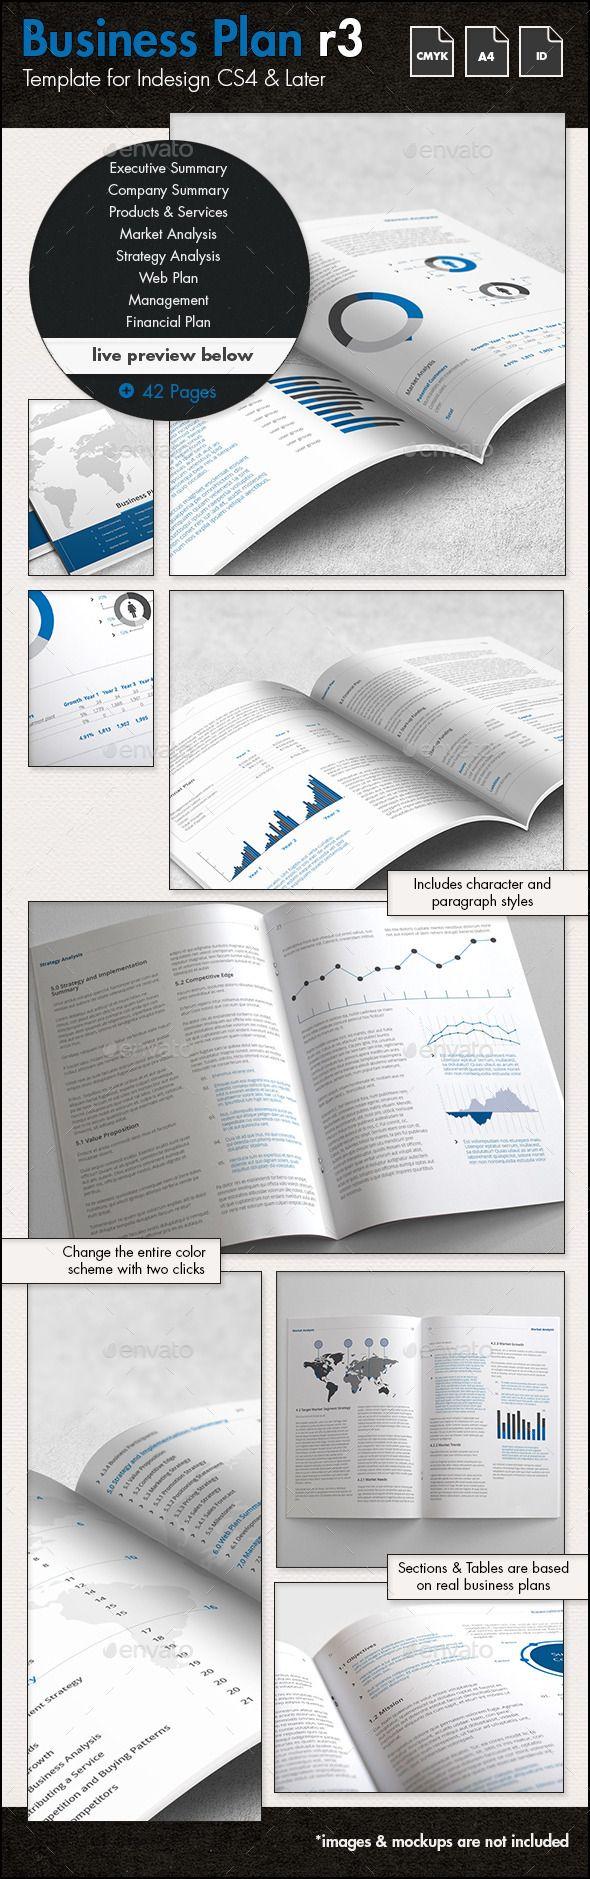 20+ Business Plan PowerPoint Designs & Templates – PSD, AI